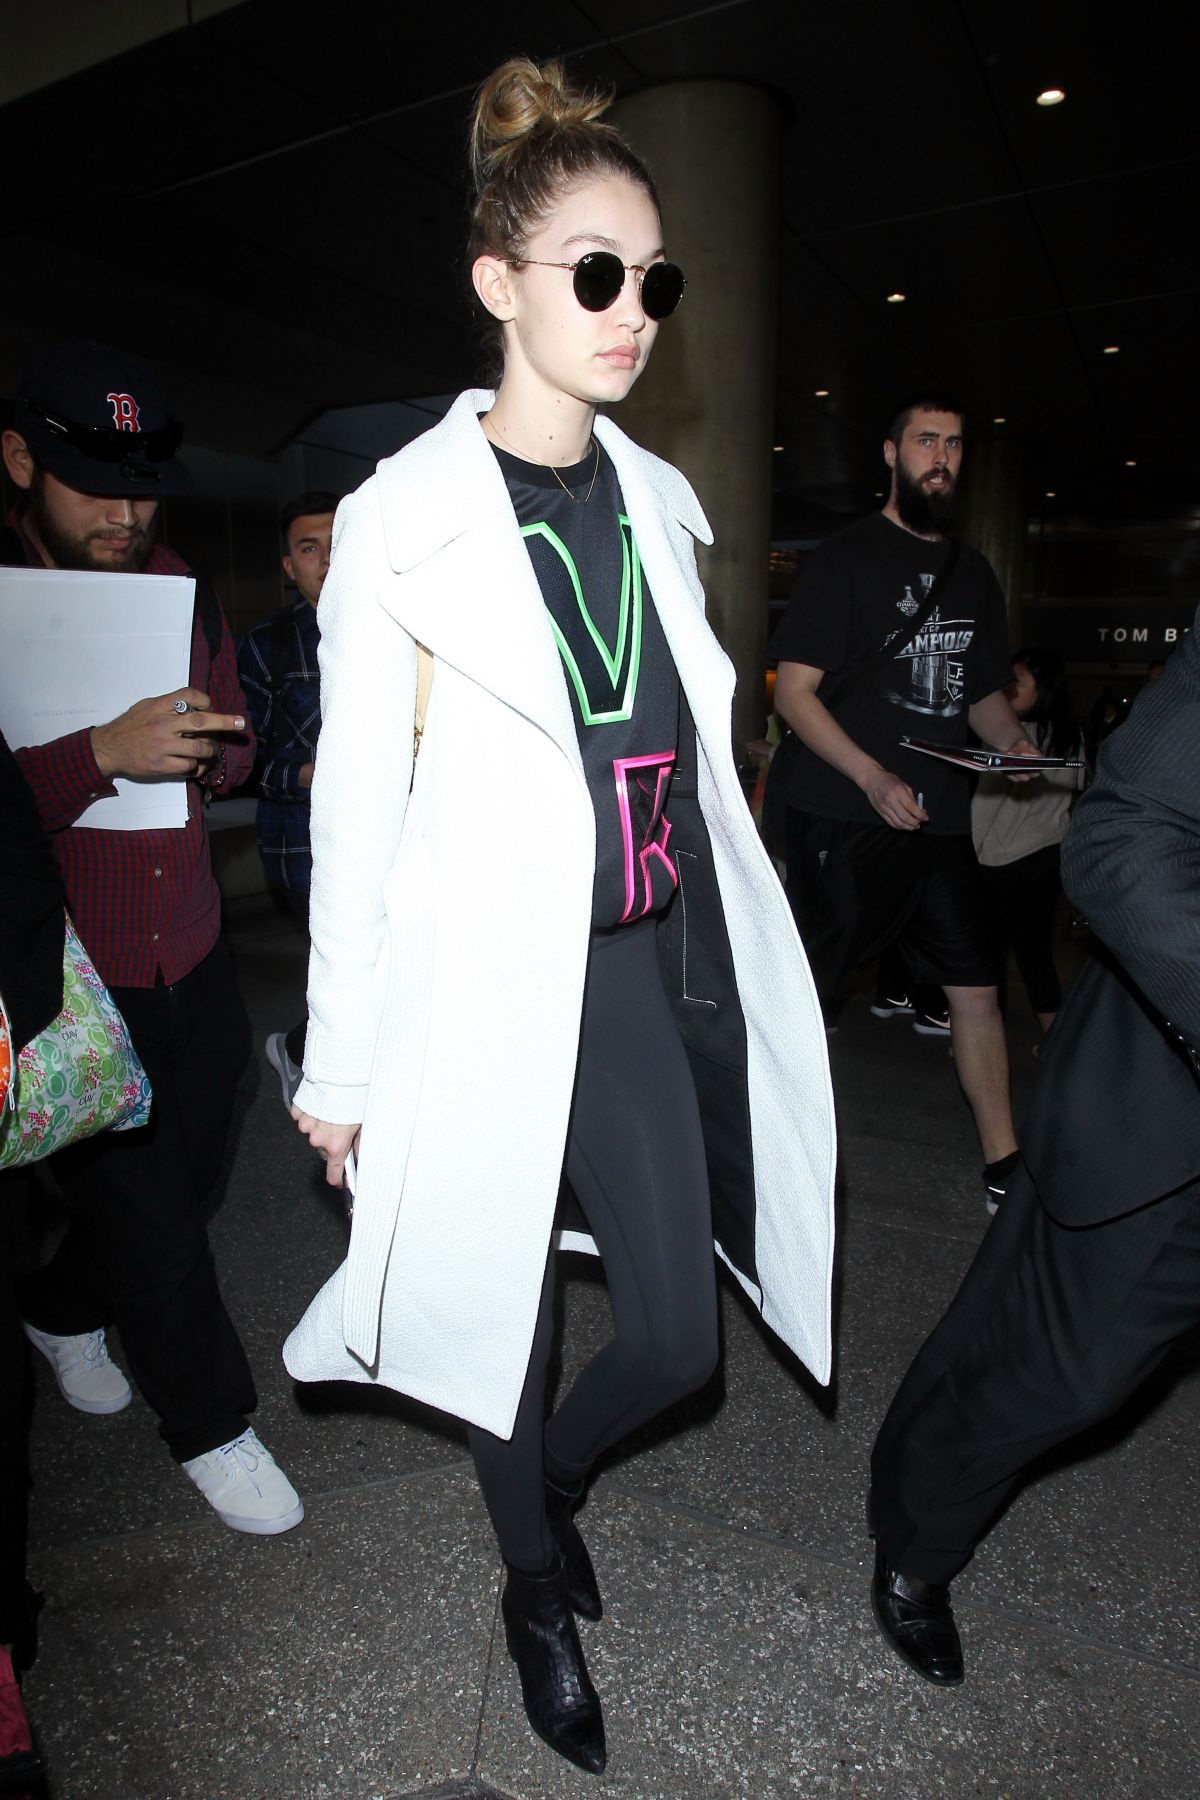 Gigi hadid at lax airport in los angeles new photo